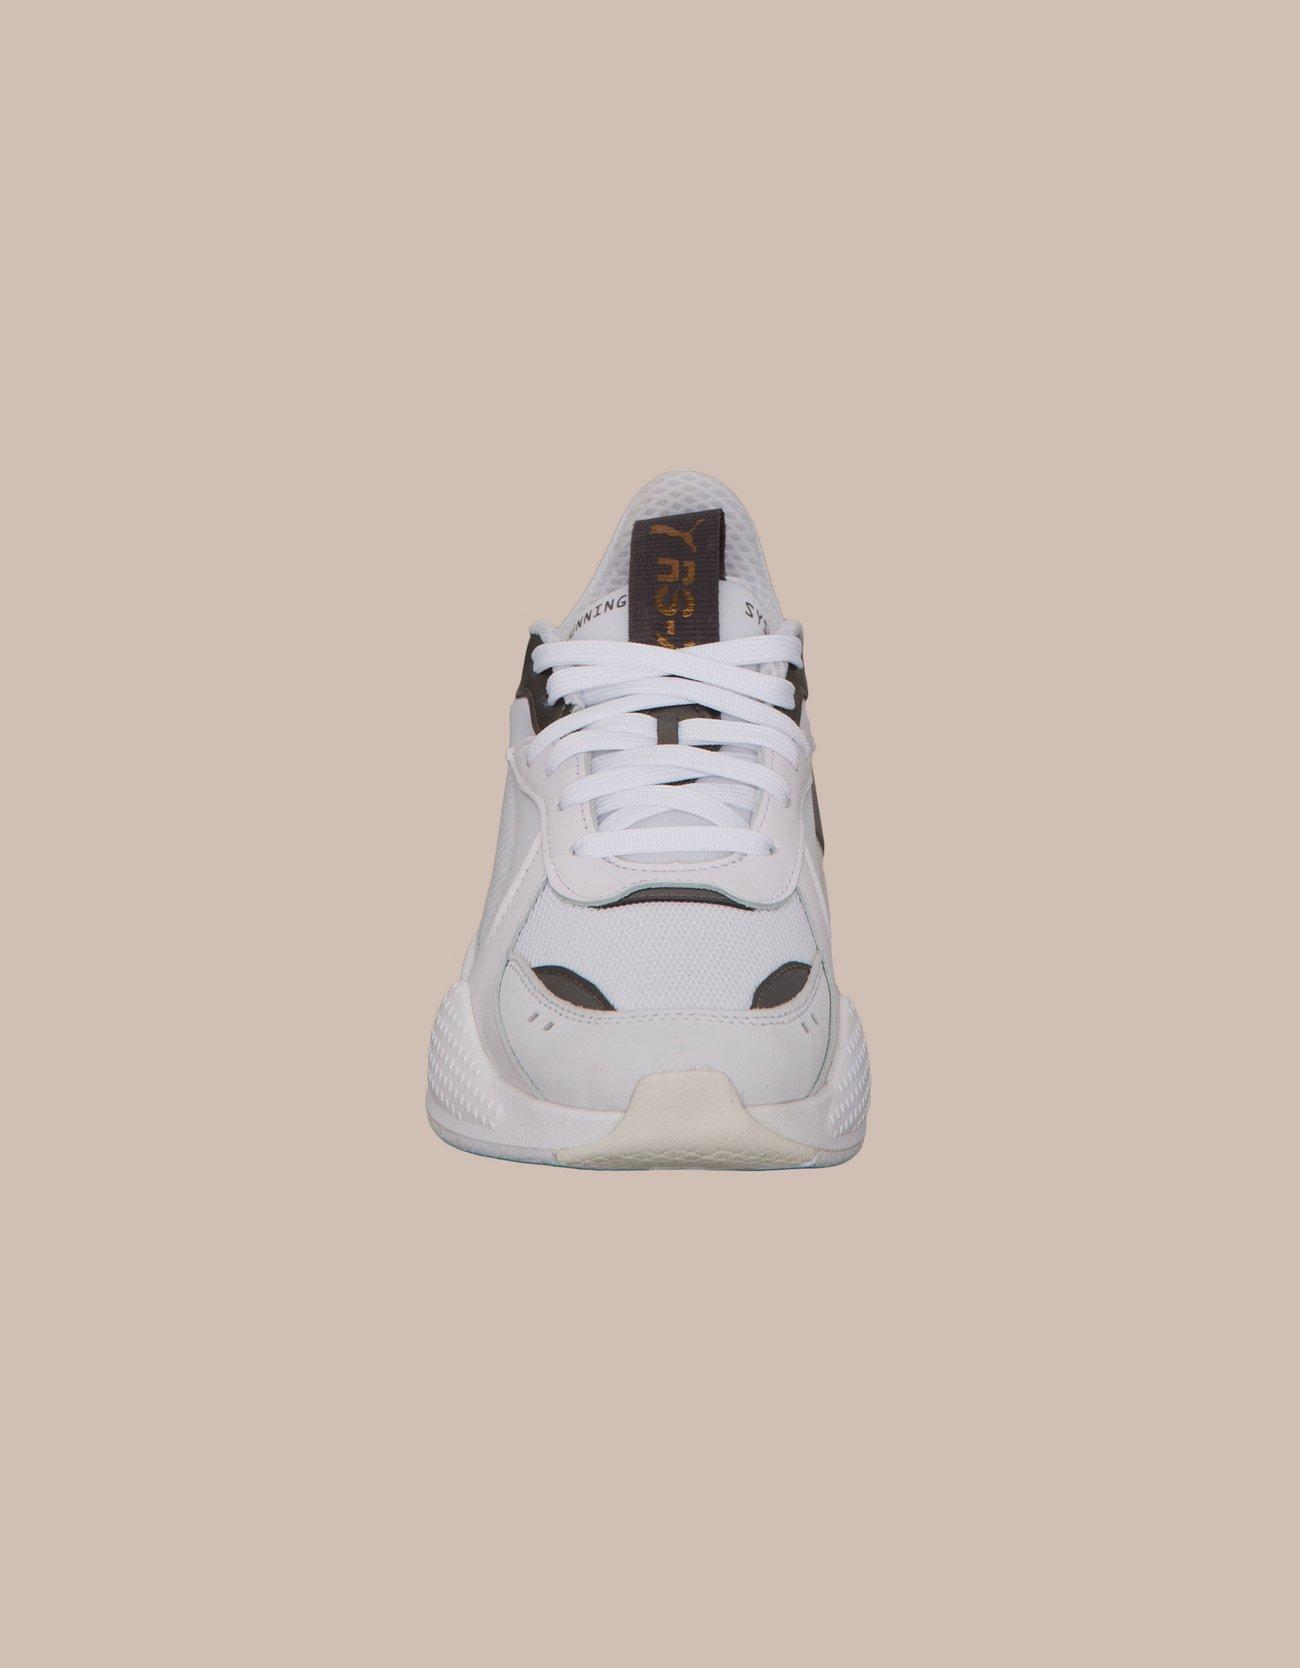 cheaper 68ac7 d9faf Sneaker showdown   Nlyman.com